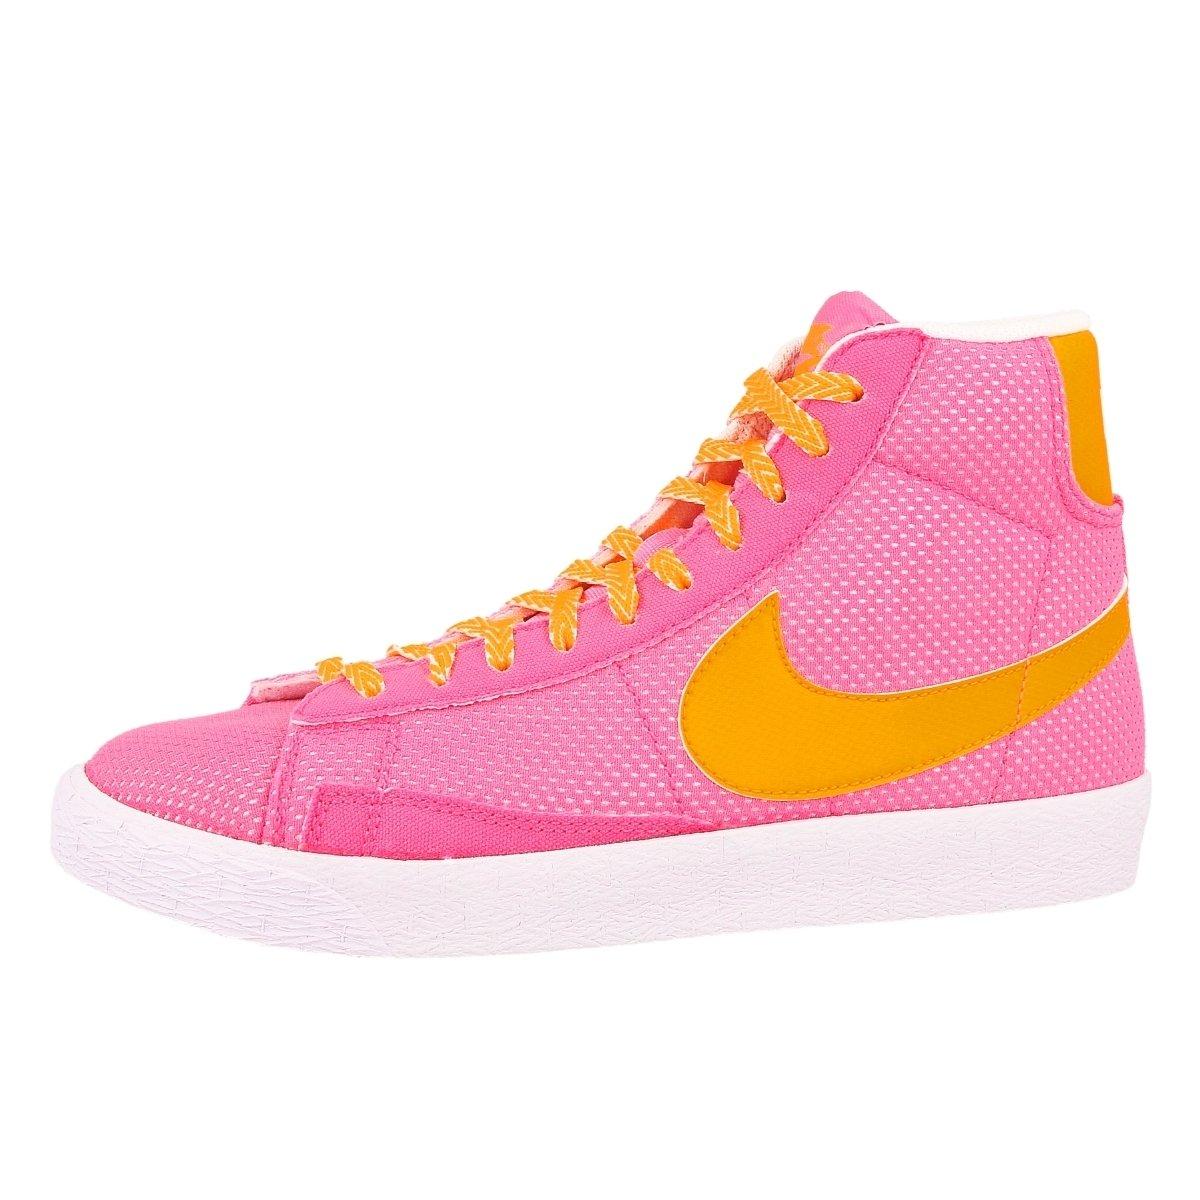 san francisco 319b0 5ef18 Amazon.com   Nike blazer mid vintage (GS) hi top trainers 539930 602  sneakers shoes (uk 5.5 us 6Y eu 38.5)   Fashion Sneakers